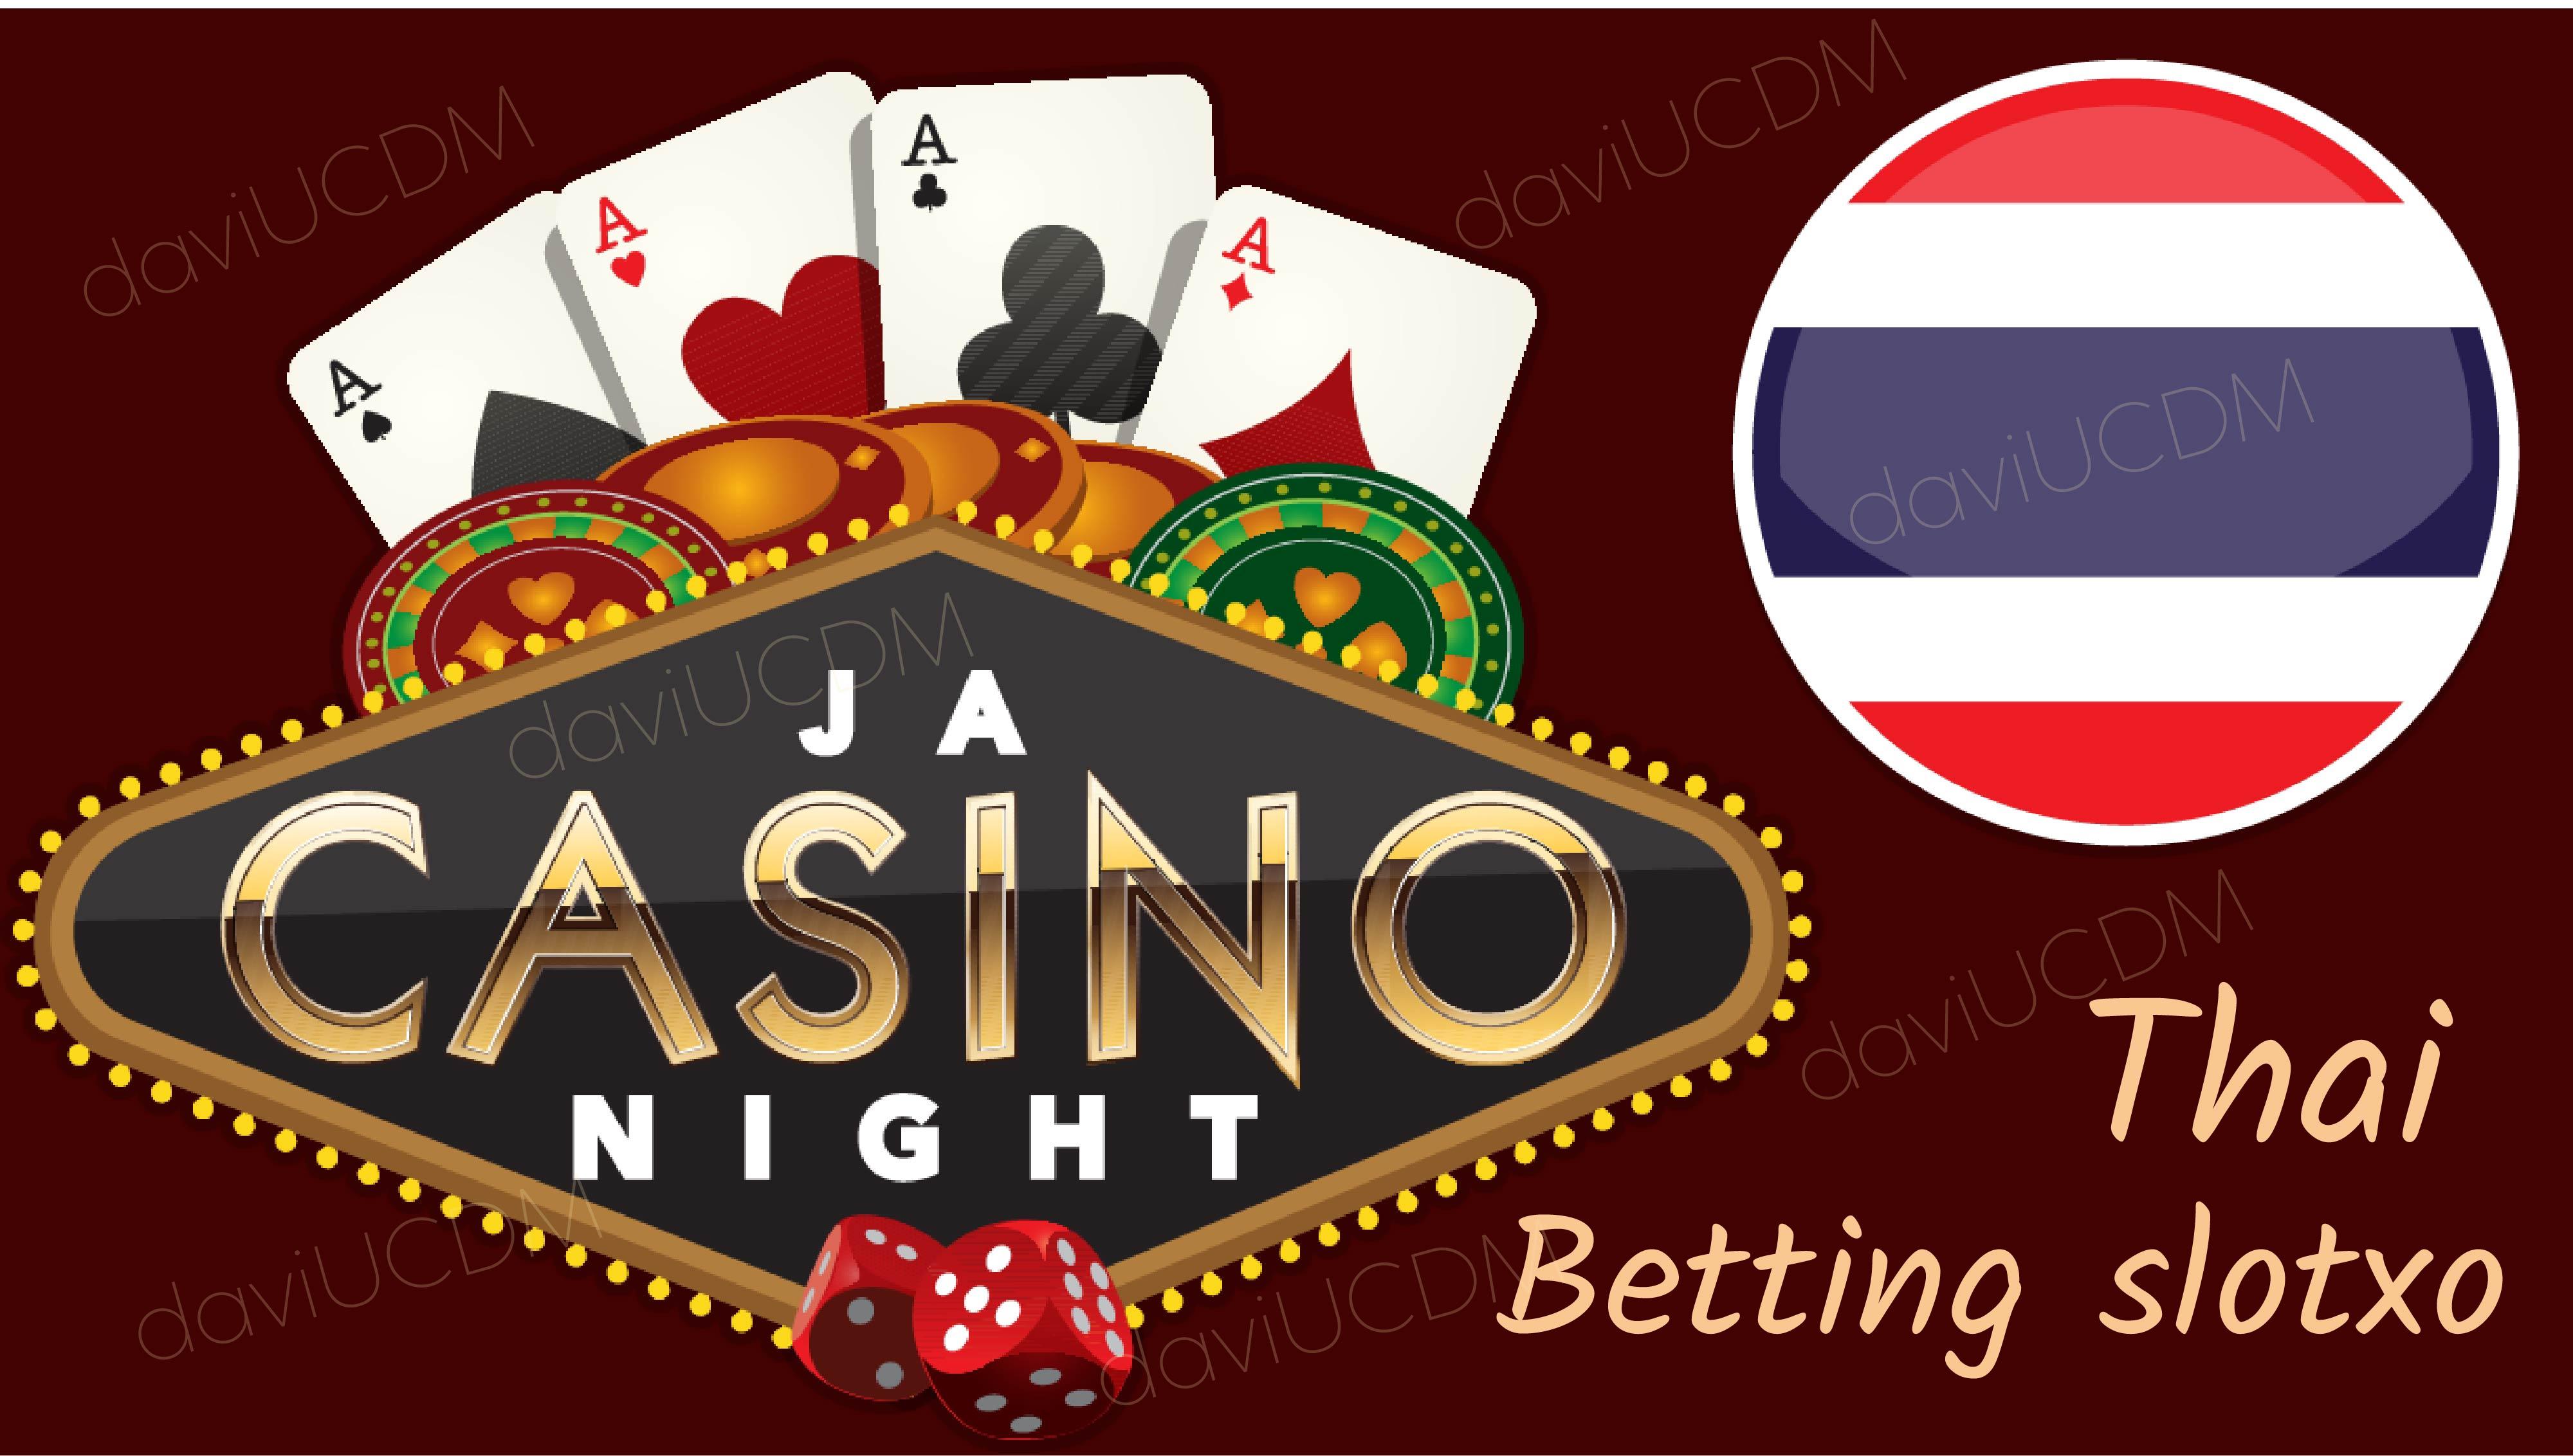 Skyrocket your site 50 PBN DR/DA 78+ Ufa Bet casino Online Poker Esports Betting slotxo Gambling